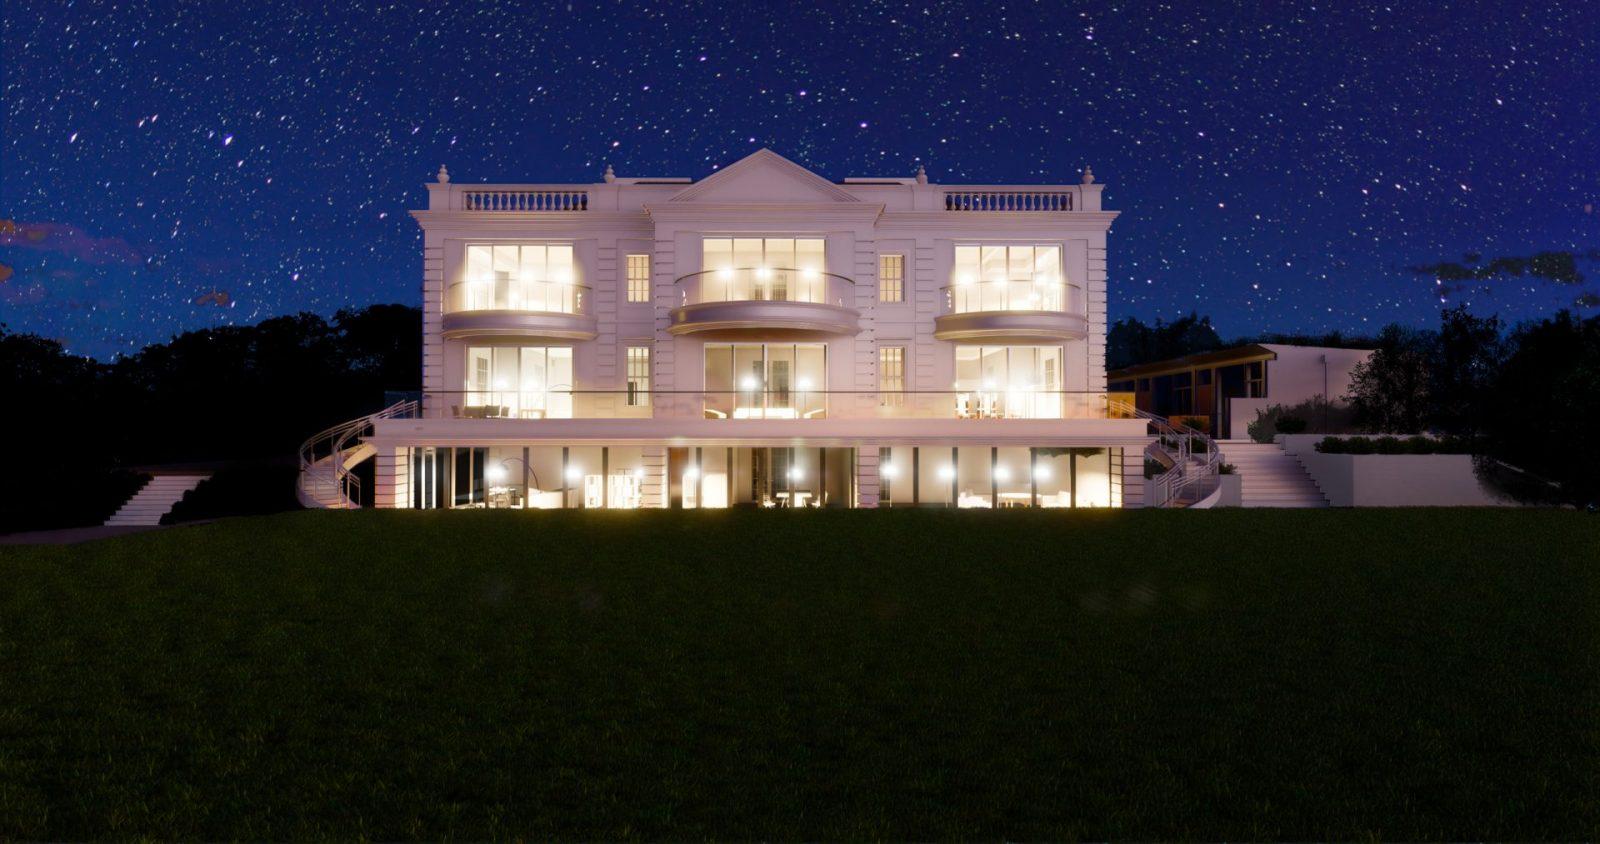 modern architecture georgian mansion architects je a8106943cc24108e23fc978401000324